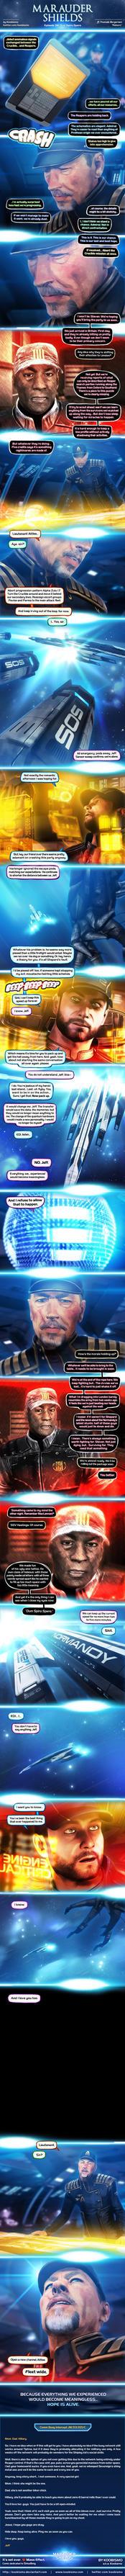 Marauder Shields 38: Dum Spiro Spero (Mass Effect) by koobismo